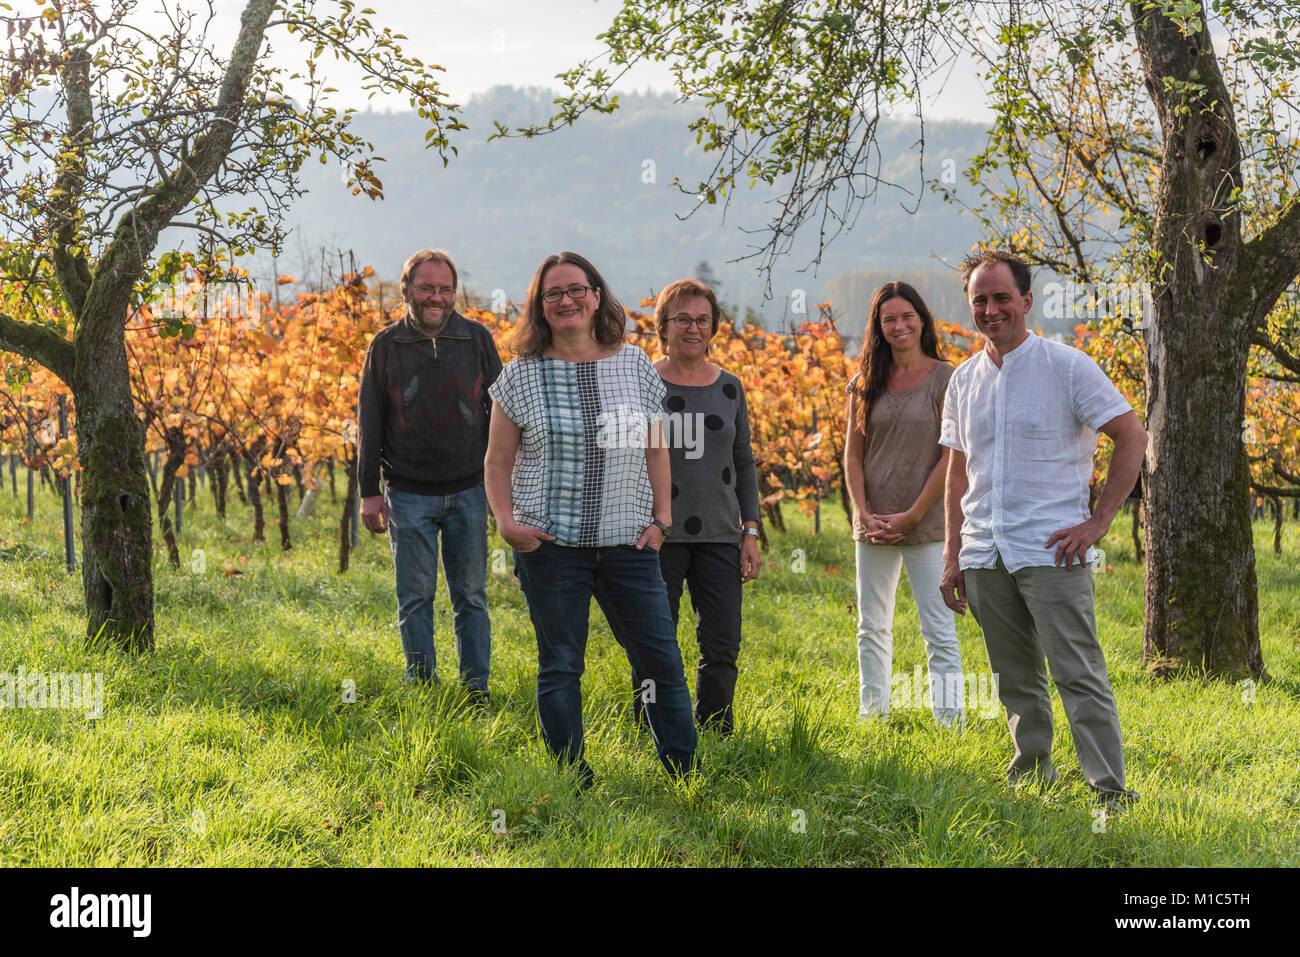 Ellwanger familiy, Bernhard Ellwanger winery, Grossheppach, Germany - Stock Image